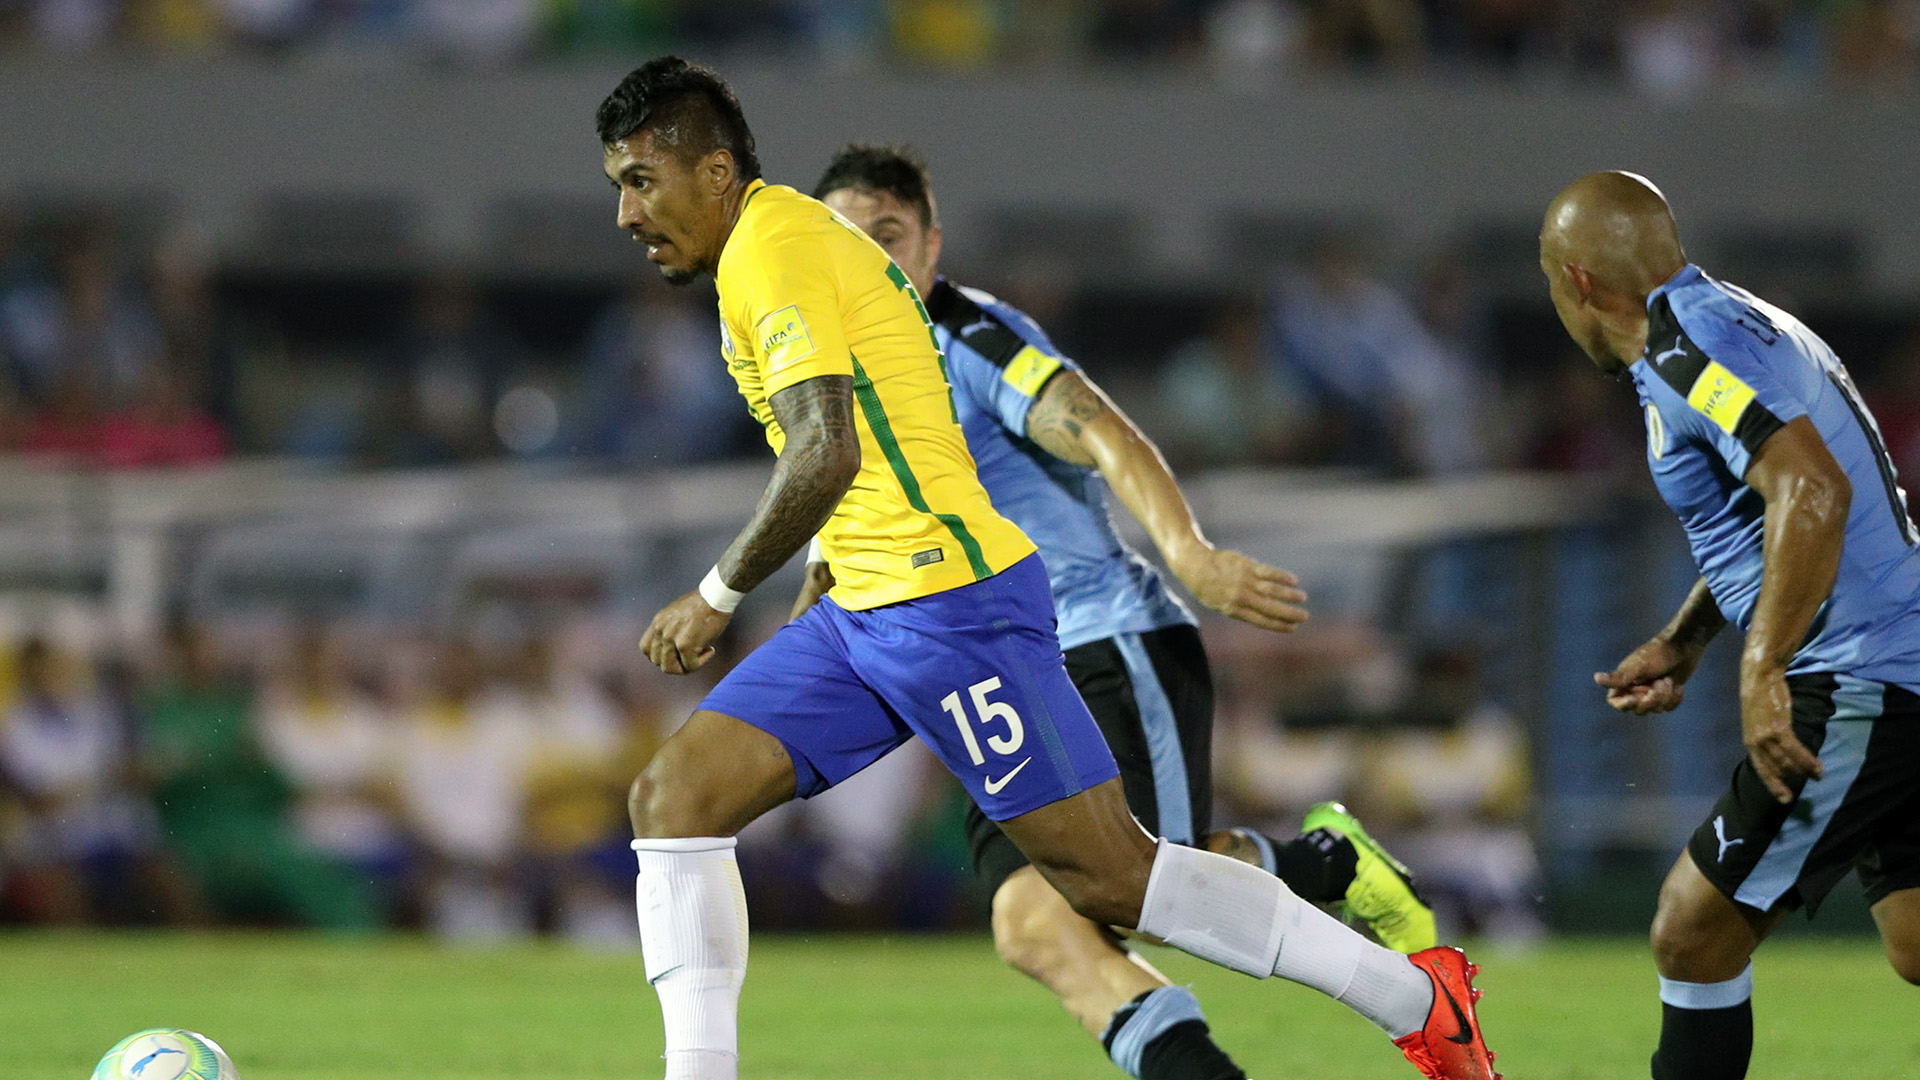 Paulinho Brasil Uruguai Eliminatorias 2018 23032017